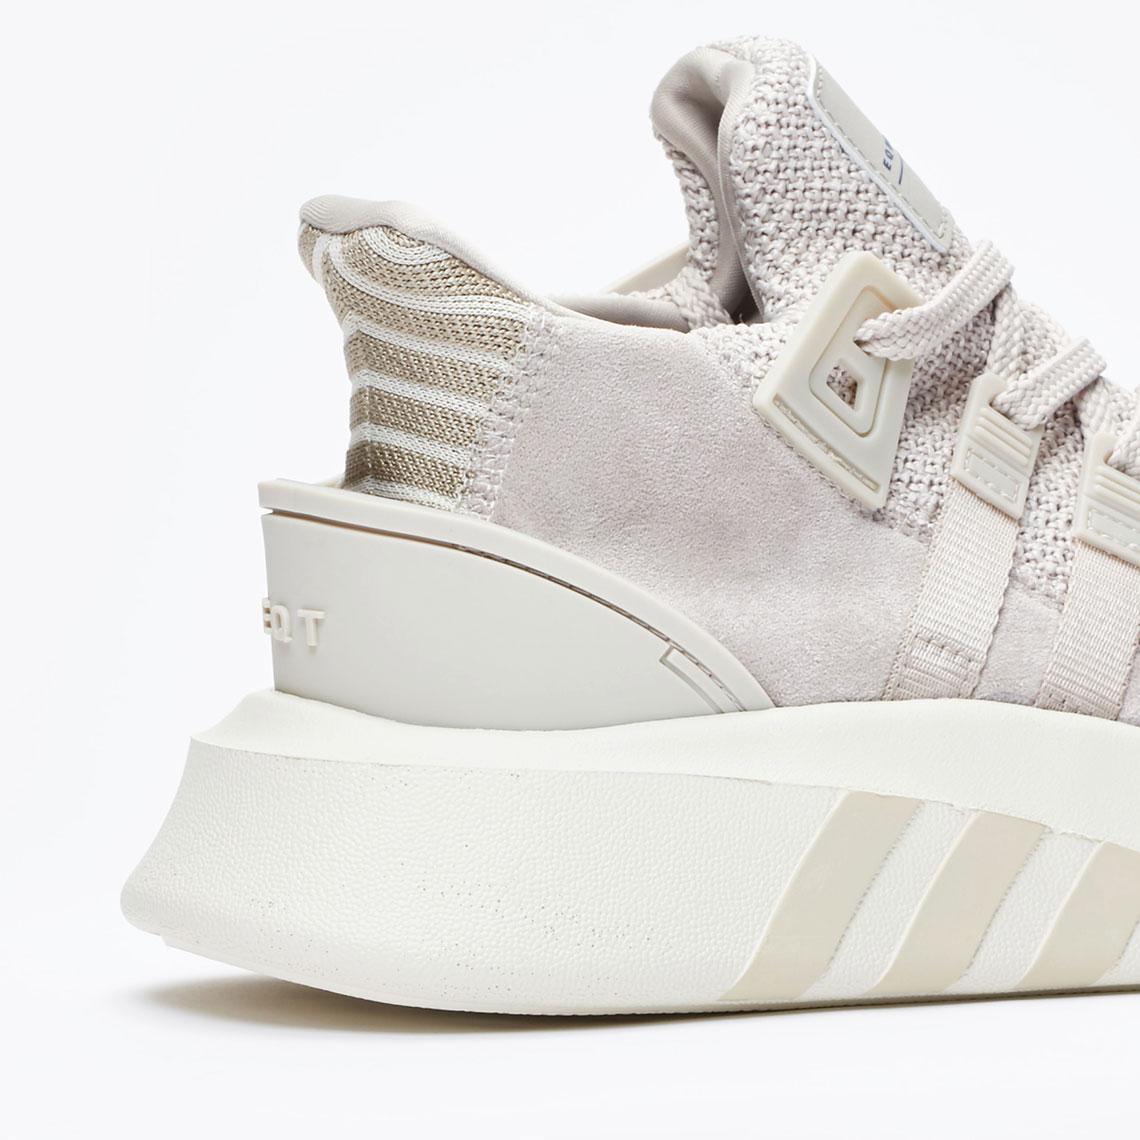 Sneakersnstuff adidas EQT Pack B37244